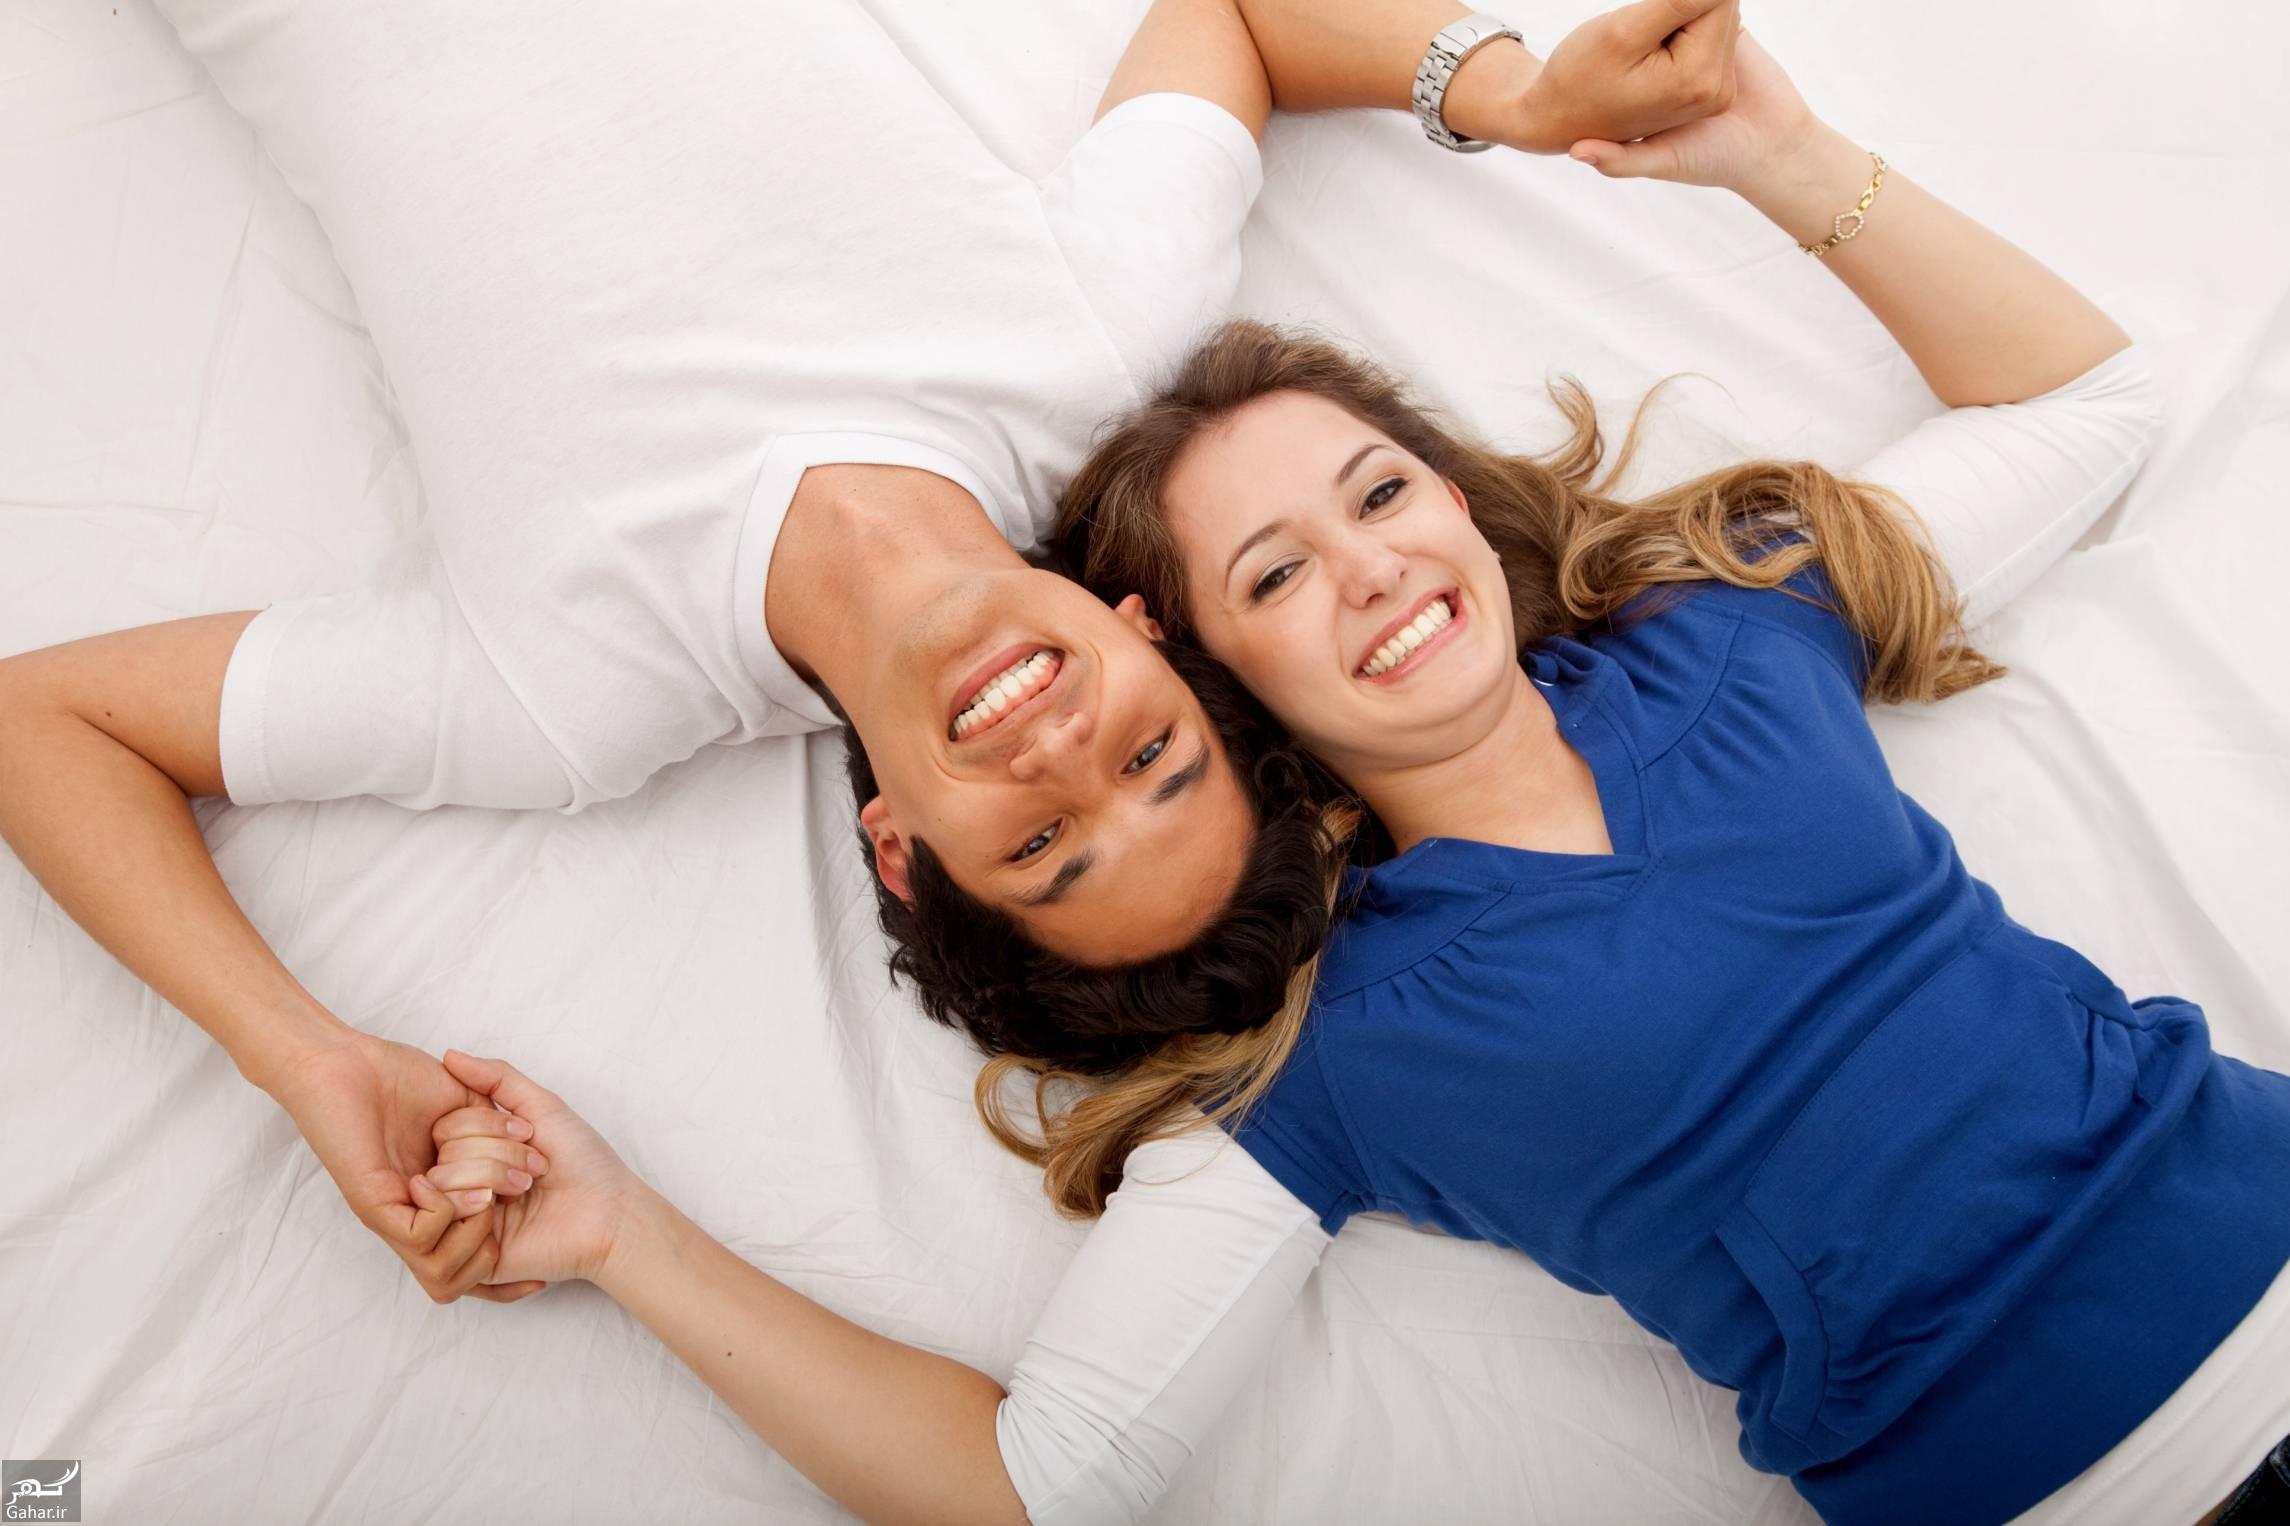 a0303447983102a راهکارهایی برای بیان خواسته هایتان در رابطه جنسی